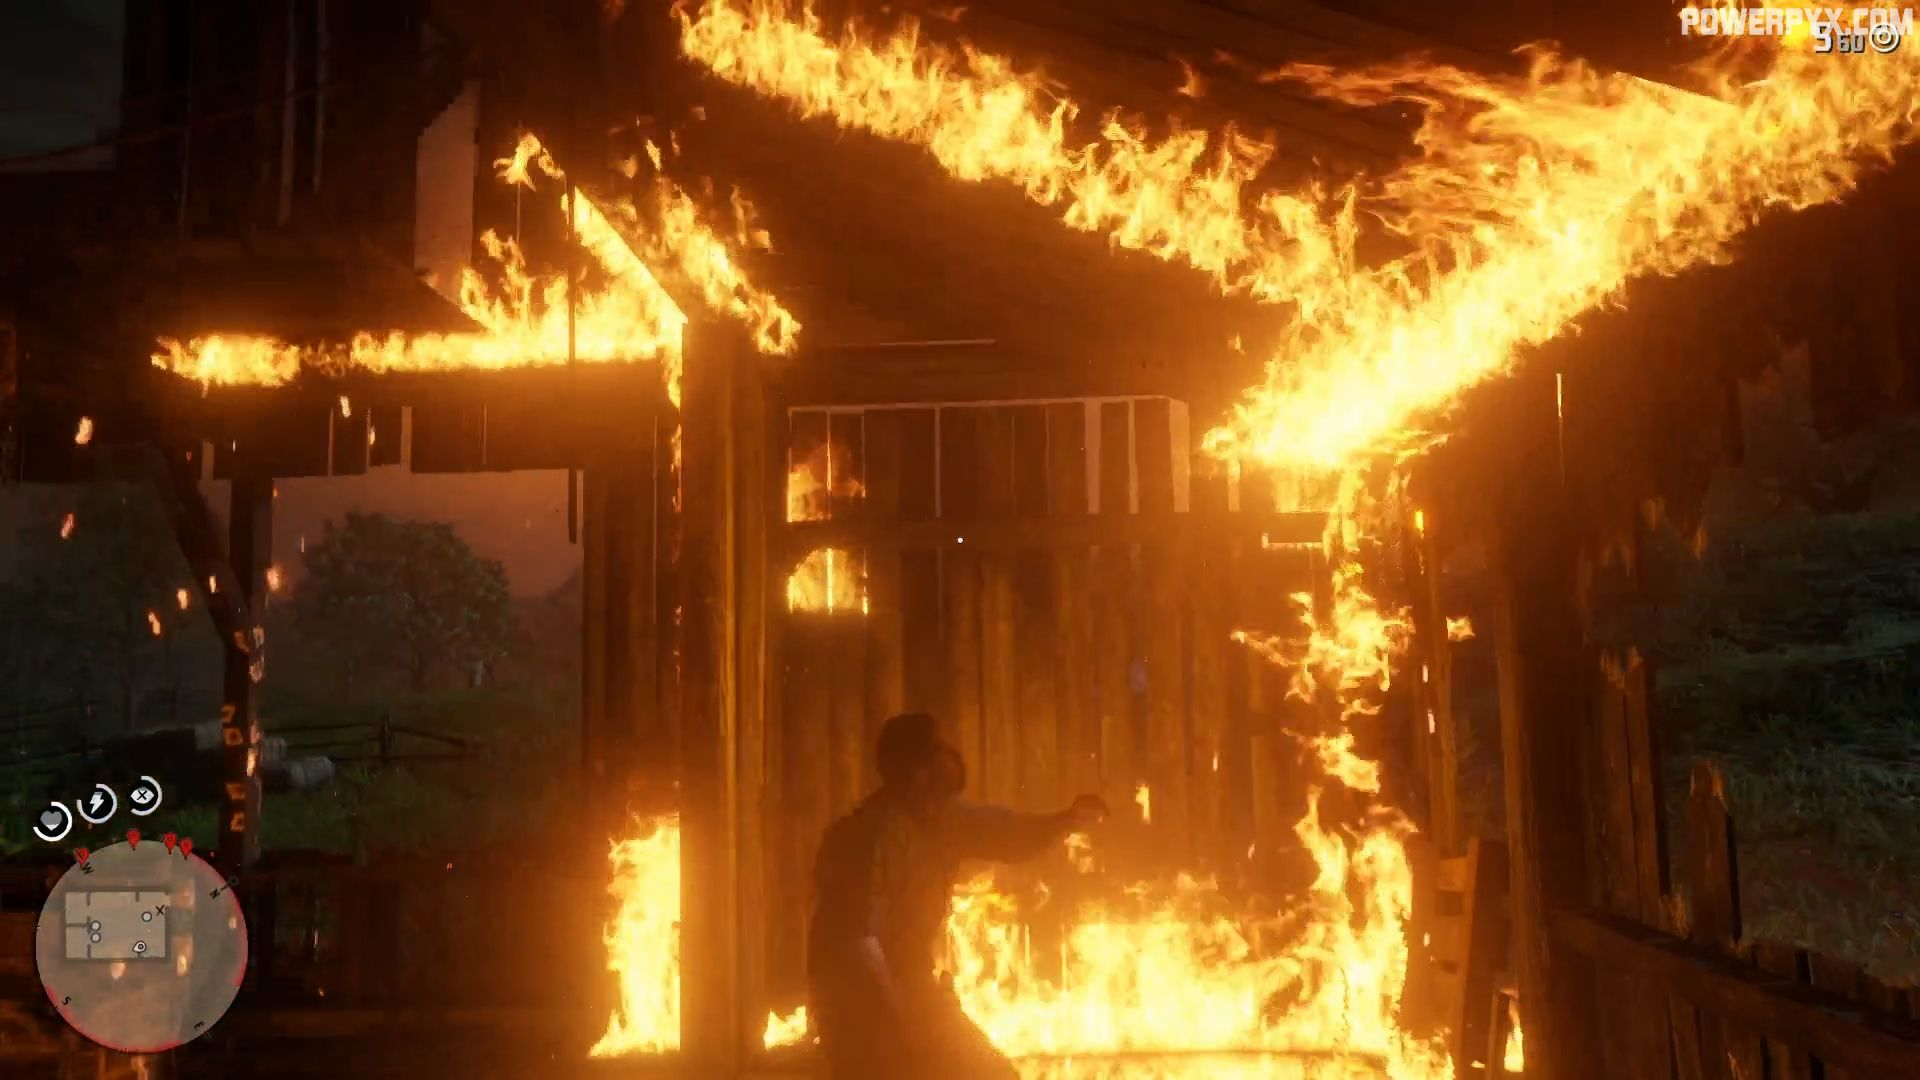 Red Dead Redemption 2 An Honest Mistake Walkthrough